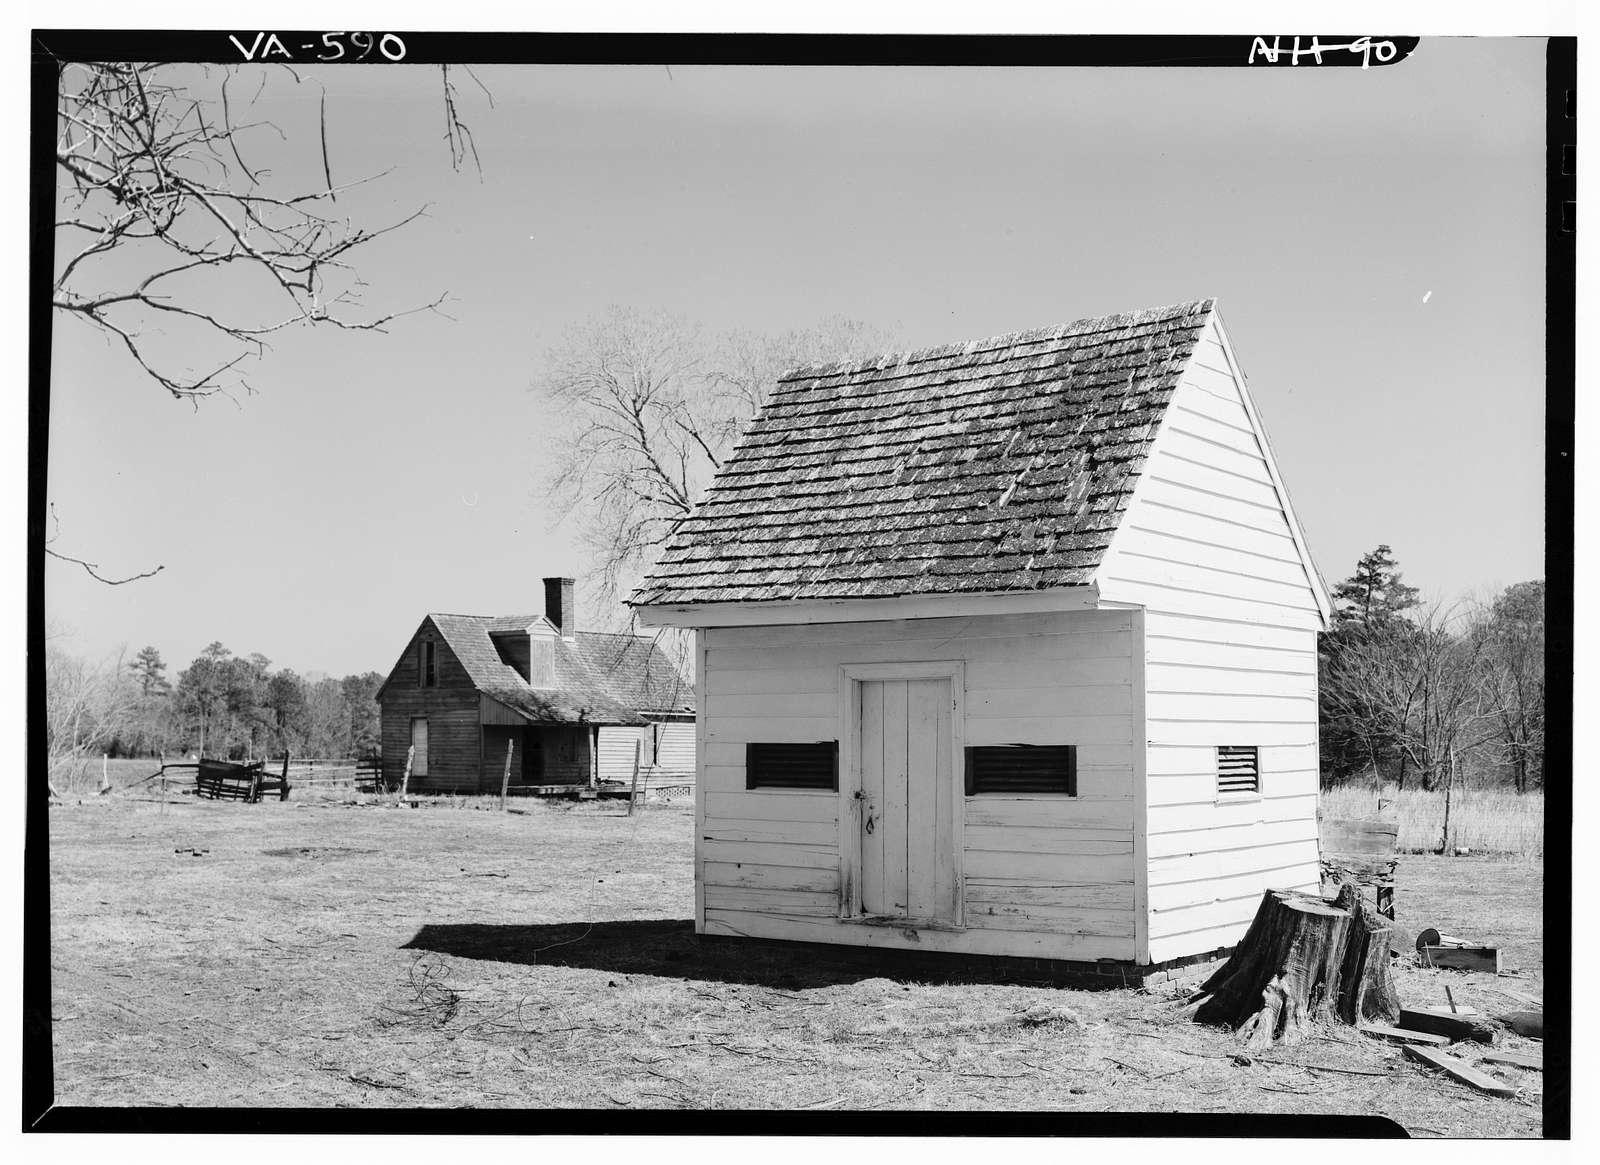 Woodlands, State Route 600 vicinity, Nassawadox, Northampton County, VA